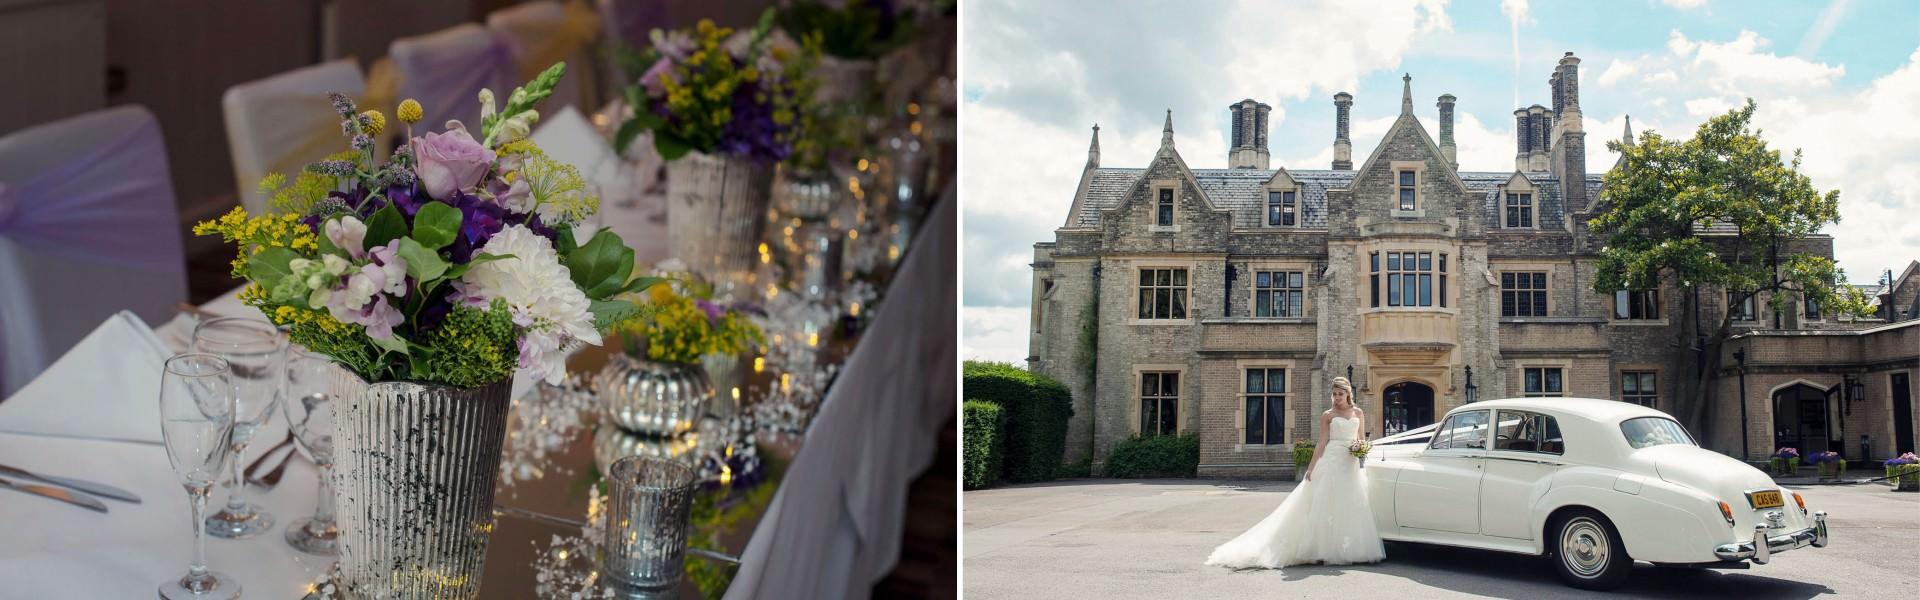 Foxhills wedding Manor 2.jpg